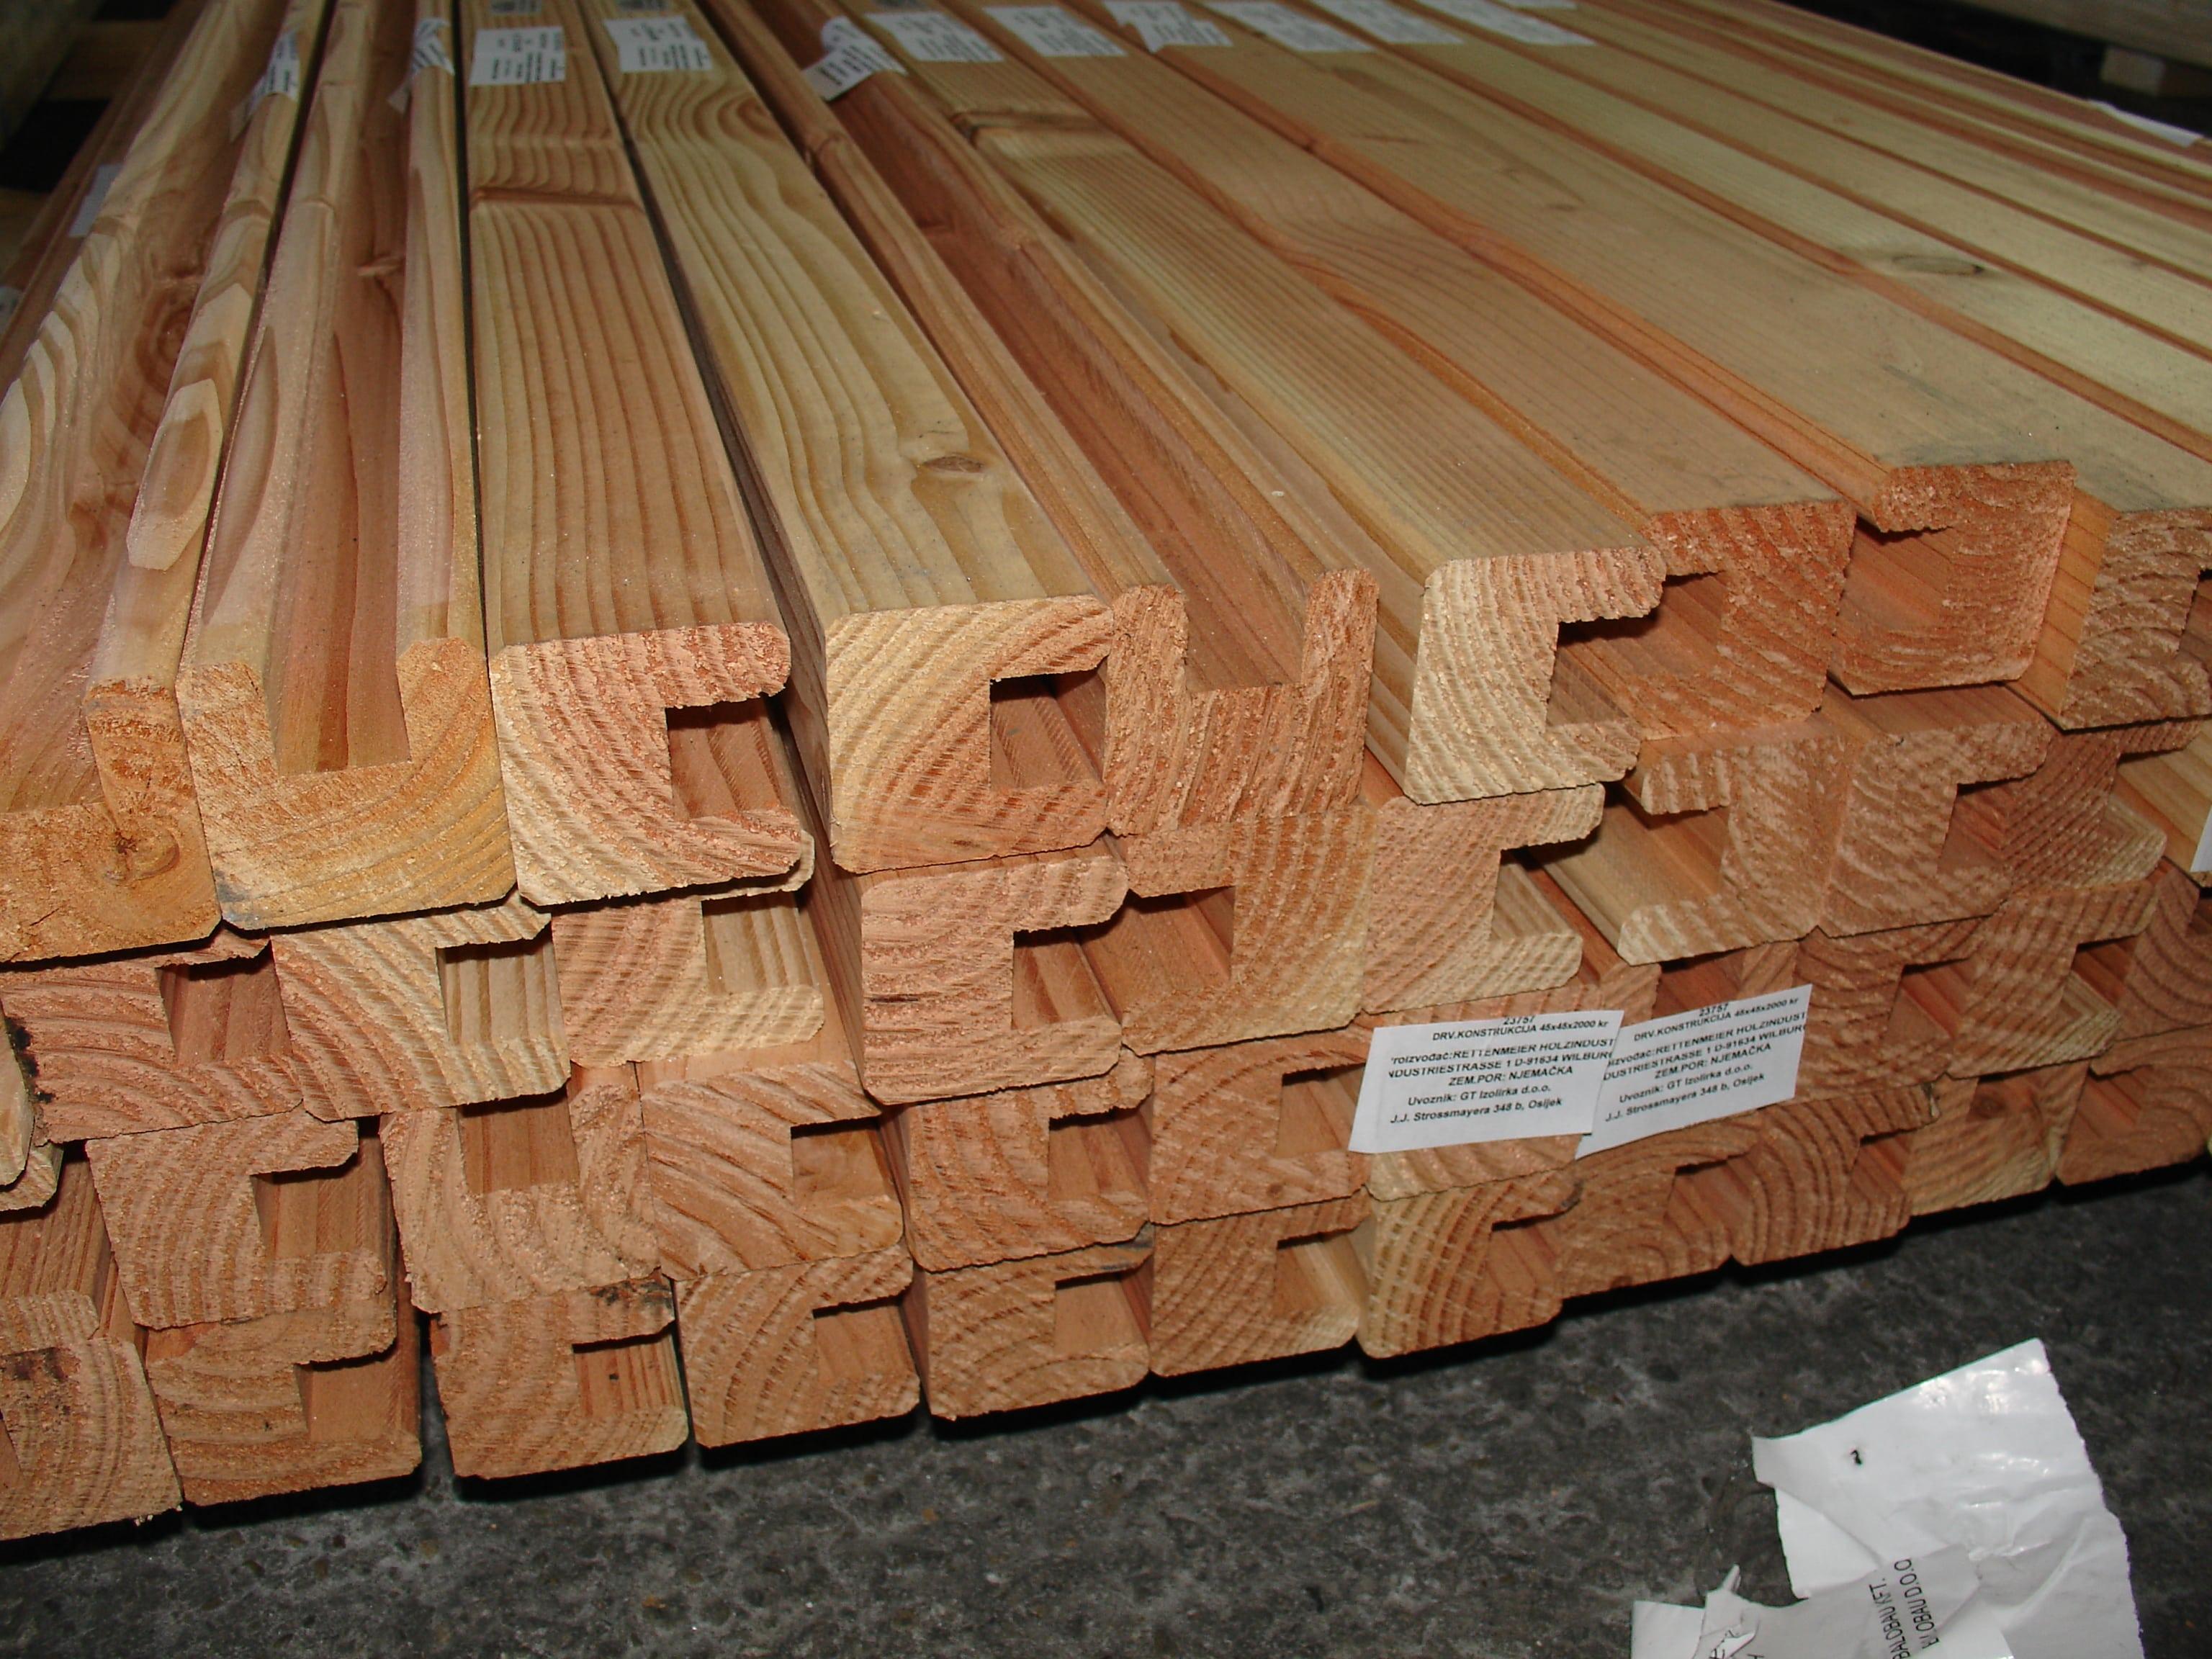 drvena konstrukcija xx kreativ dougl drvene terase drvena konstrukcija 45x45x2000 kreativ dougl